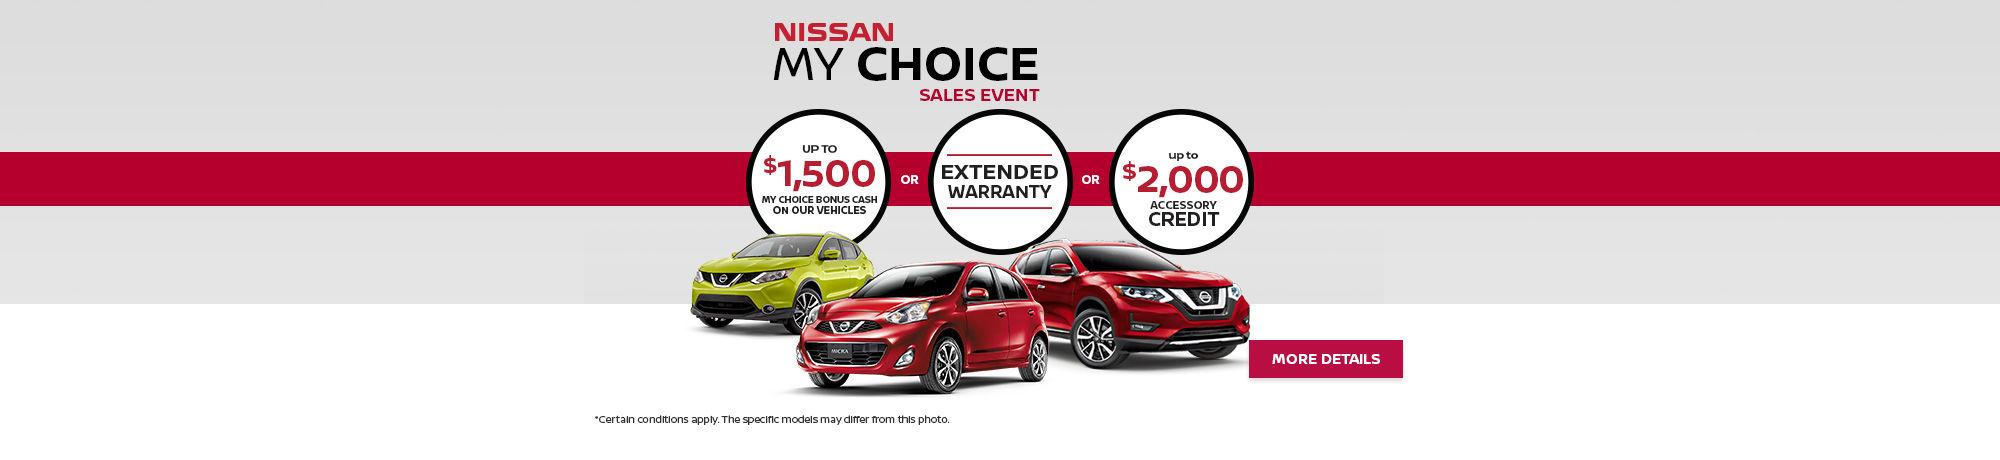 My Choice Sales Event